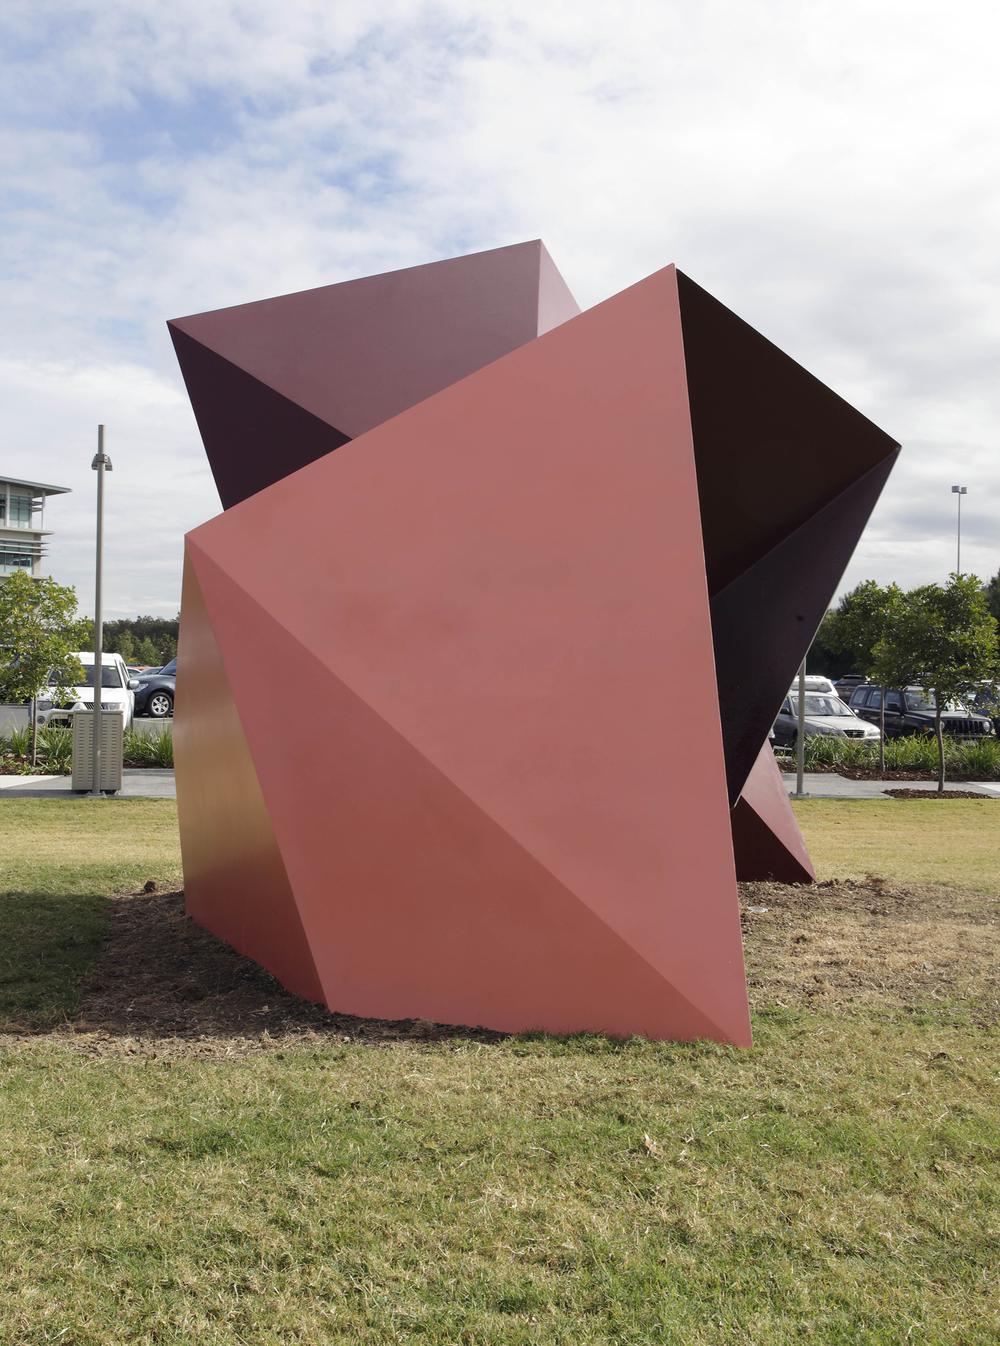 Synchro Adaptable (Peach/Red Oxide)  2010  Brisbane Airport, Brisbane Paint on aluminium 4.5 x 3 x 2.5m